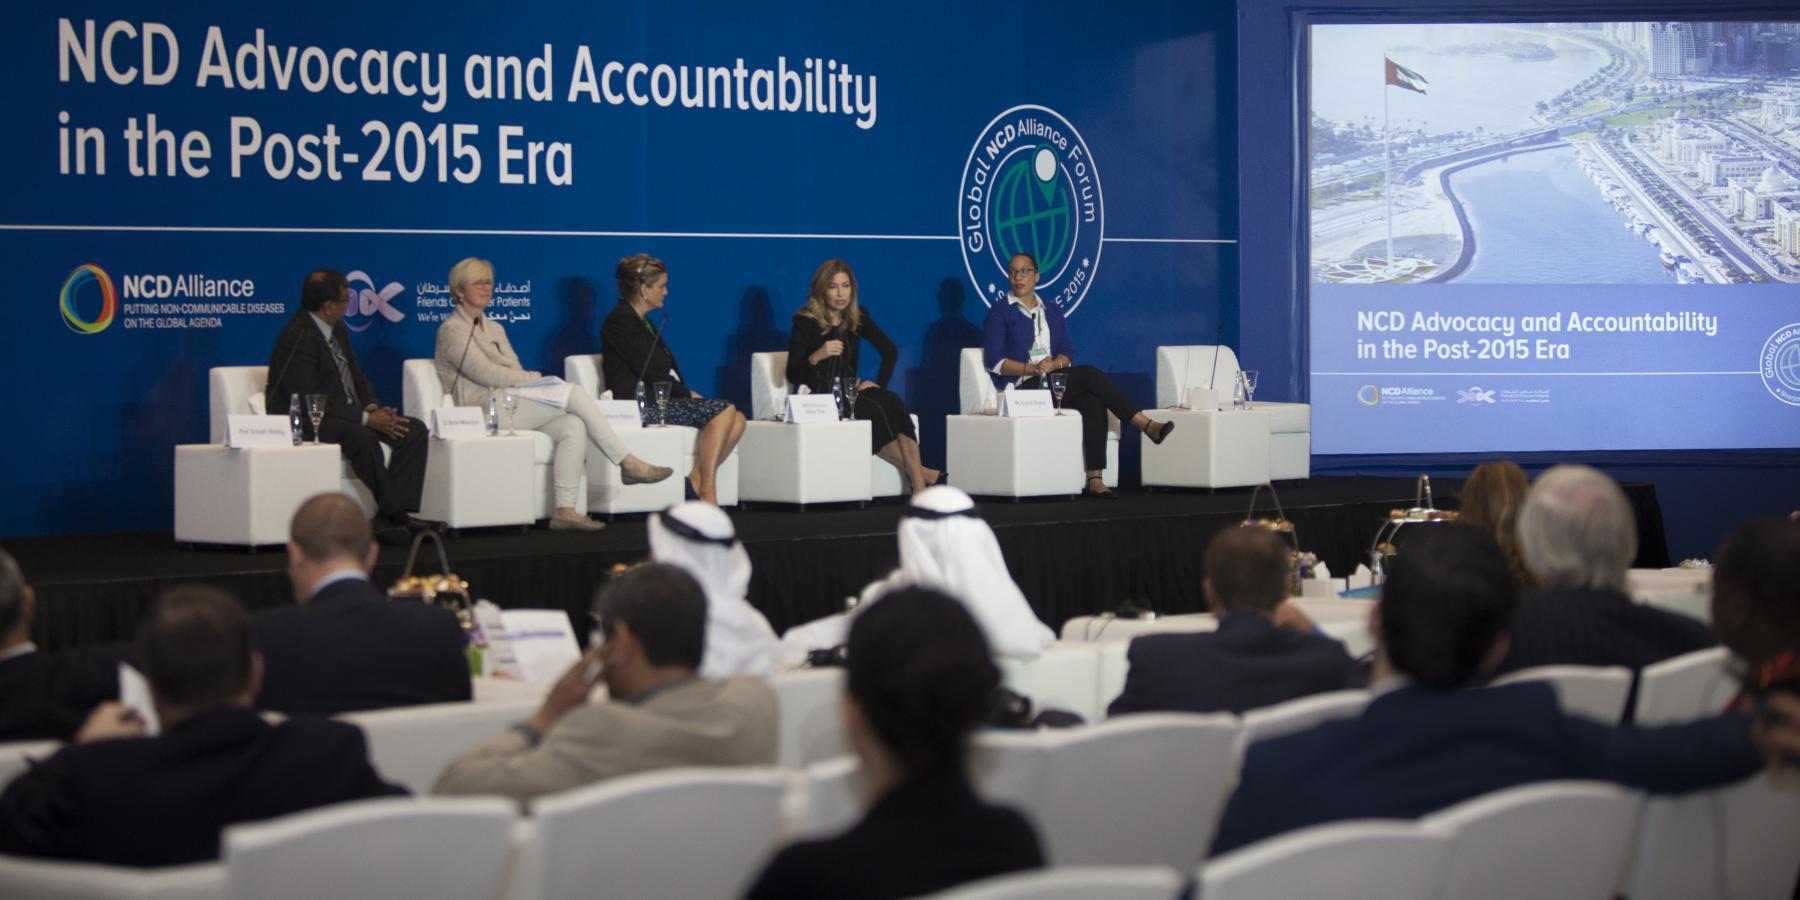 Global NCD Alliance Forum 2015